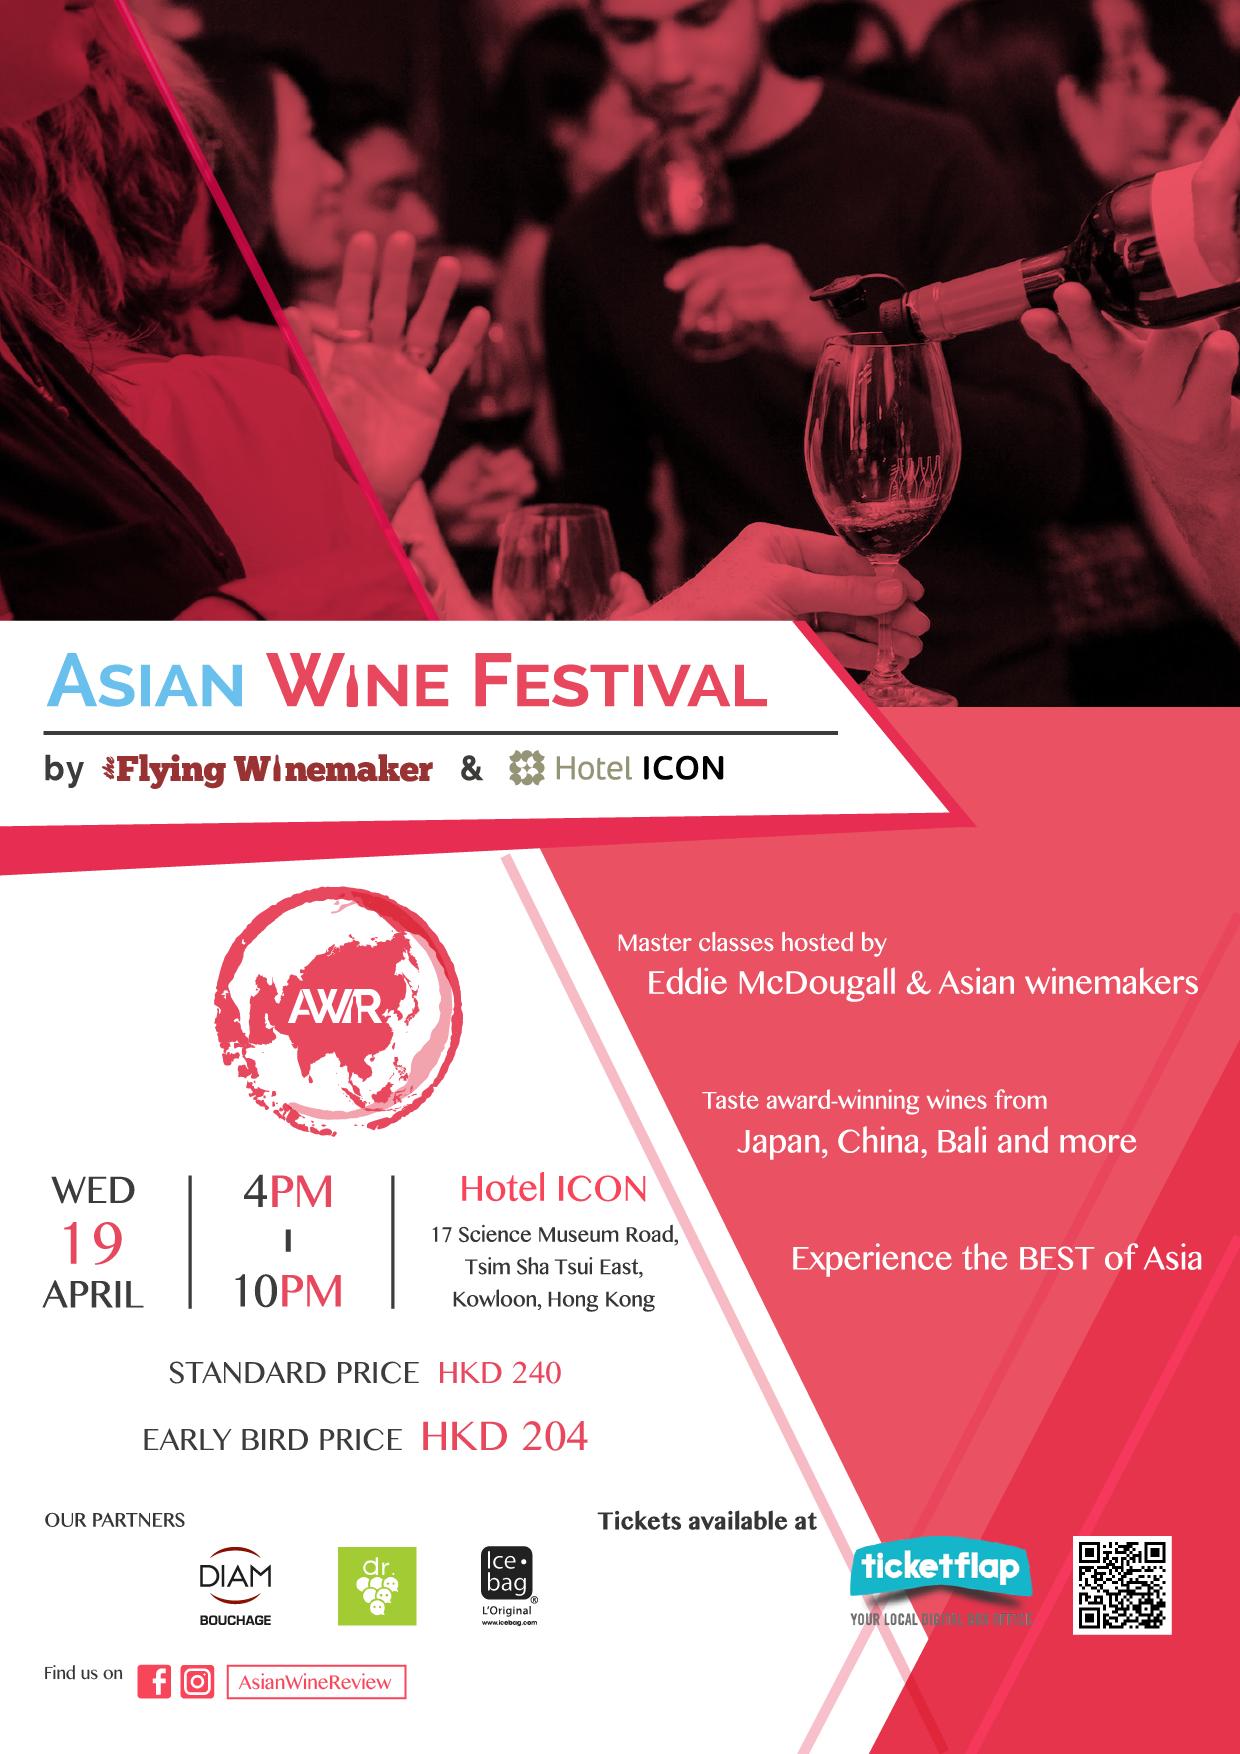 asian wine festival 2017 tickets, apr 19, 2017 | ticketflap